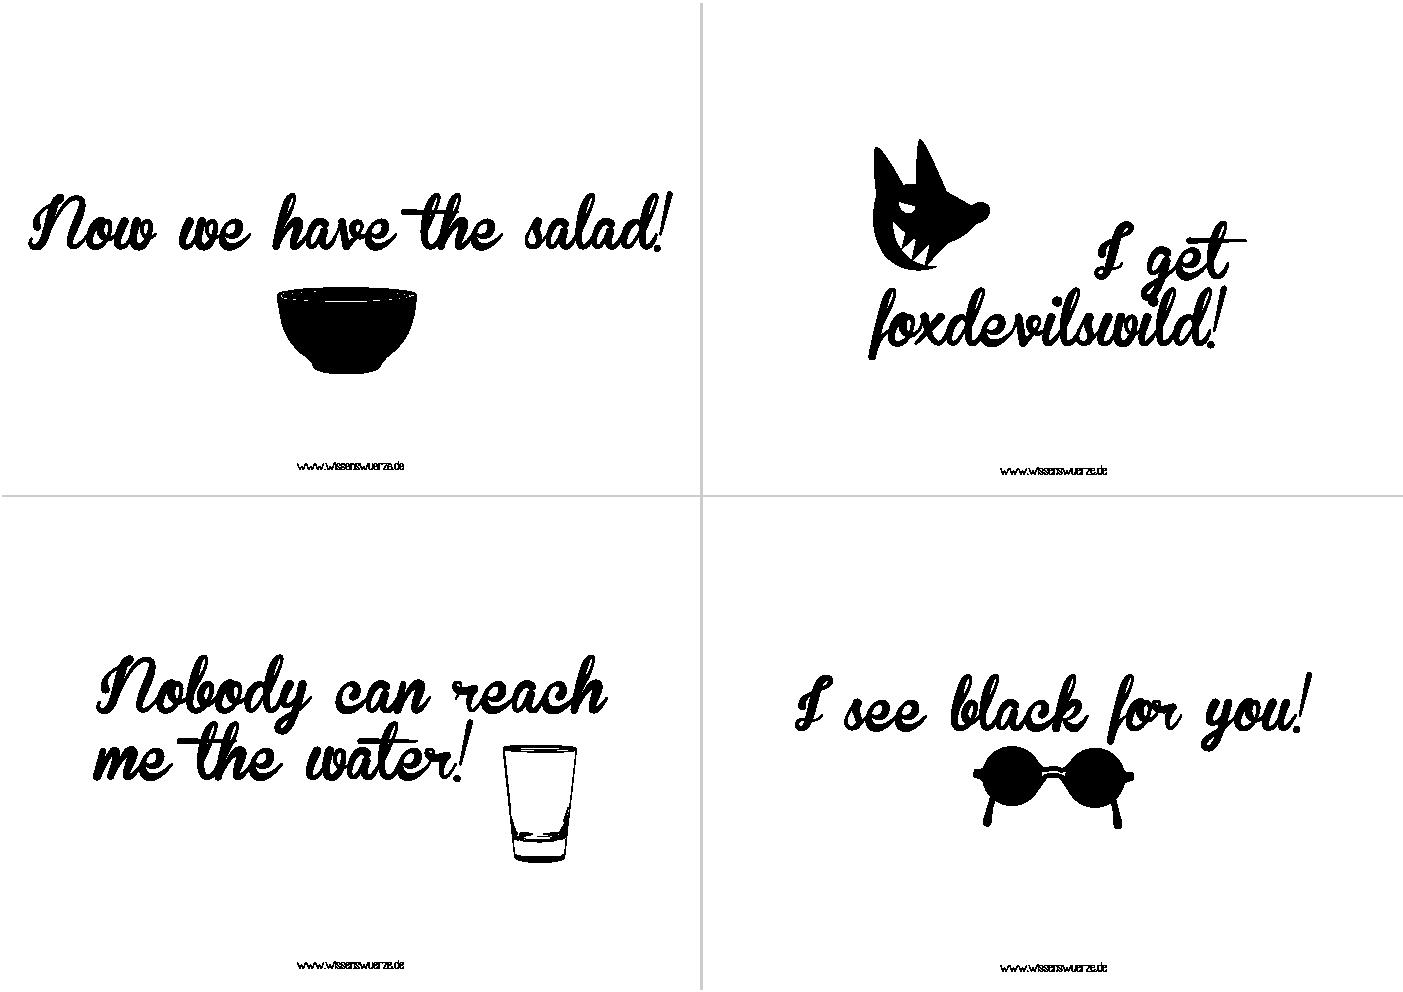 Das famose Quartett - Denglisch #3 | etiketten lables ...